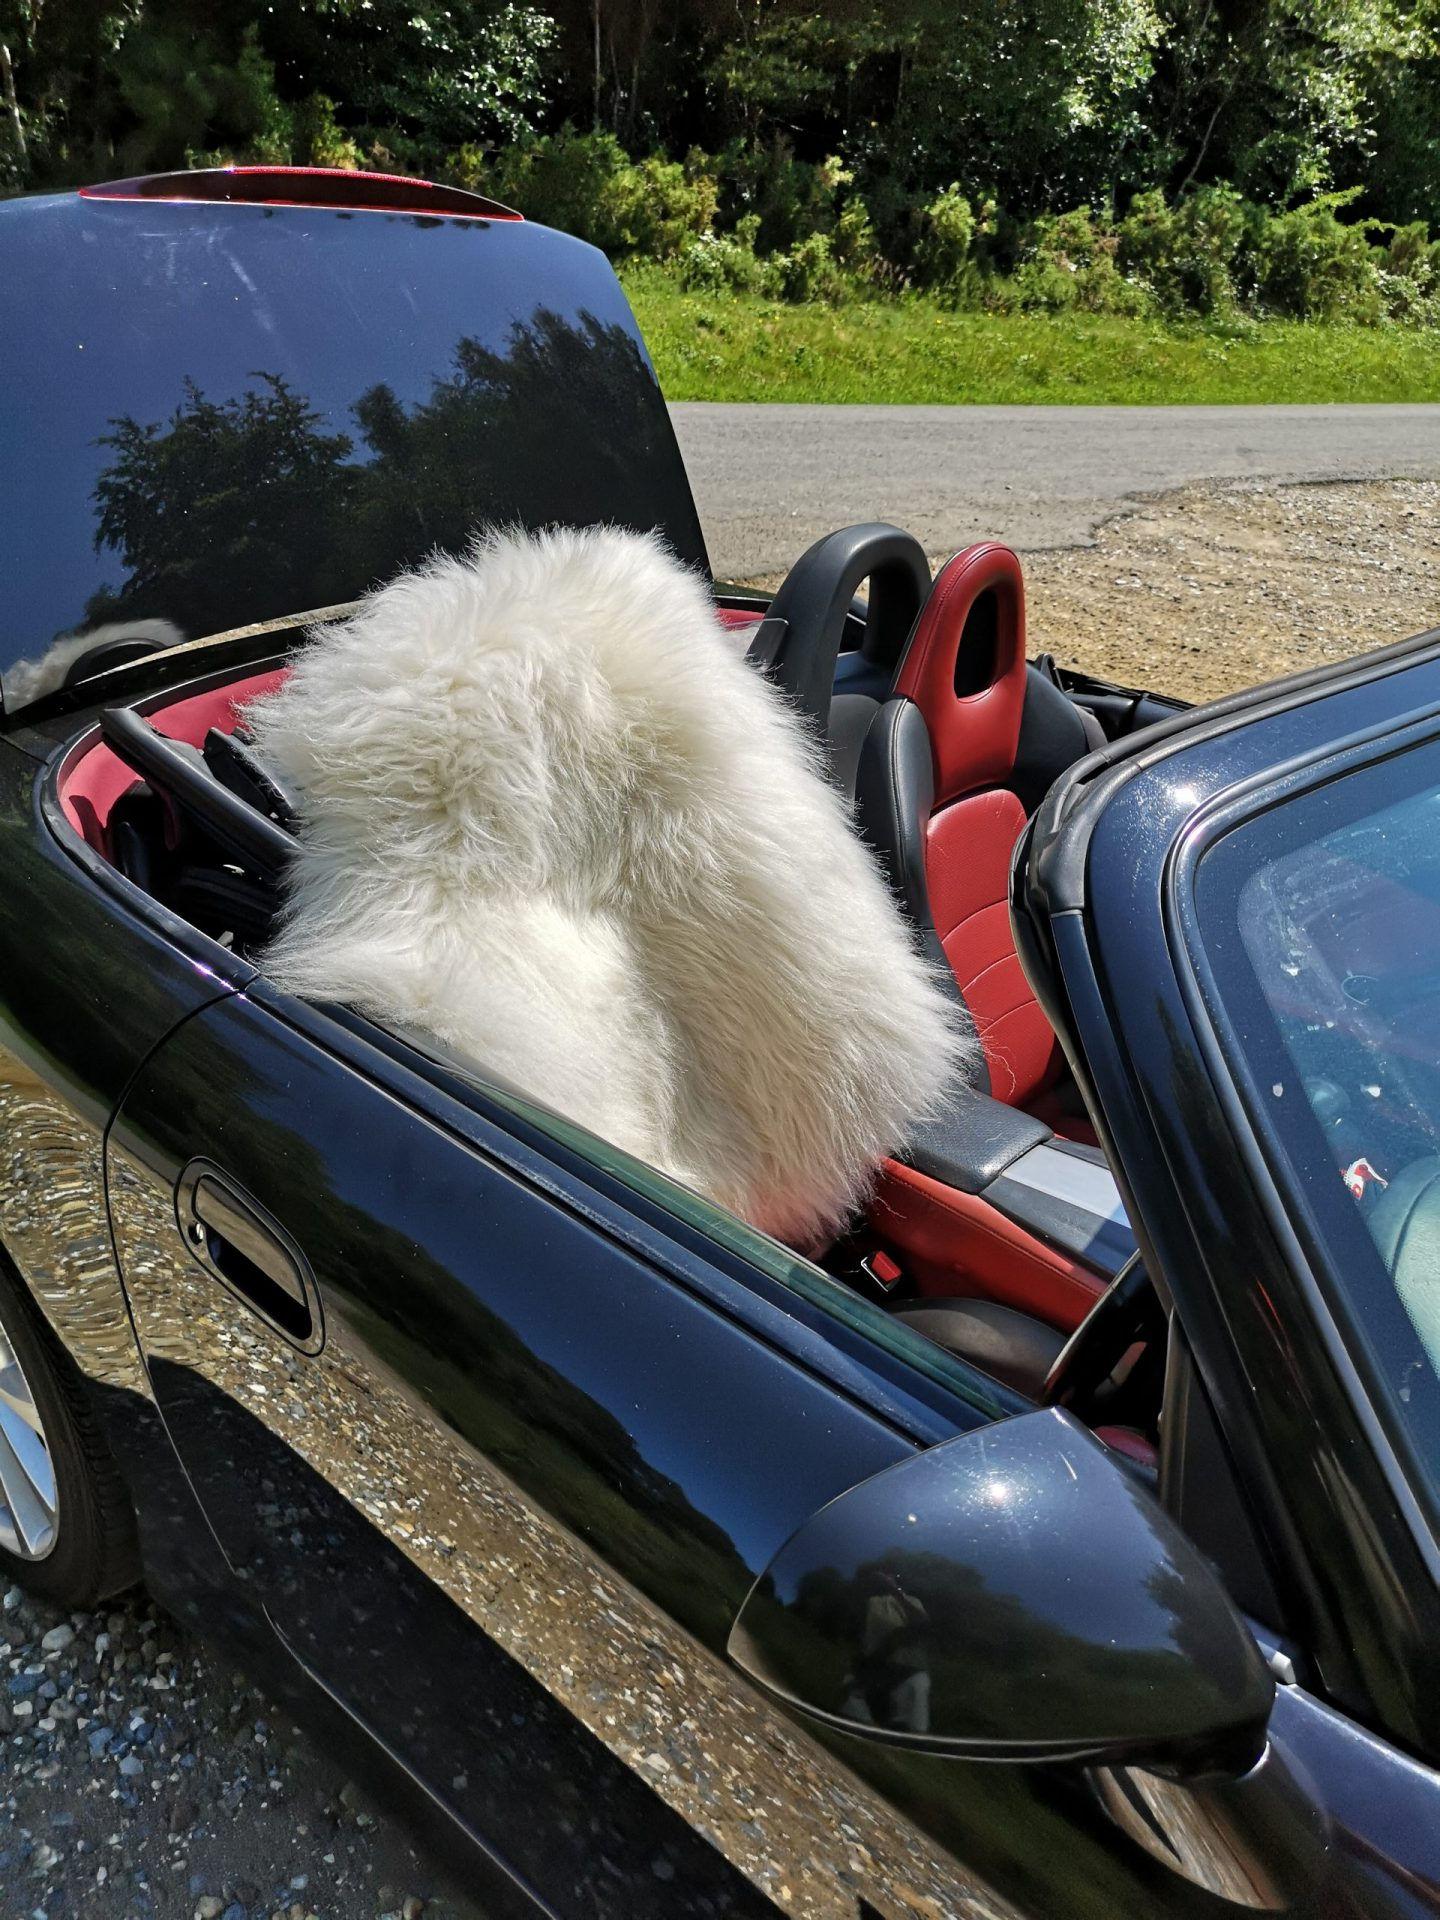 shetland sheepskin on a car seat